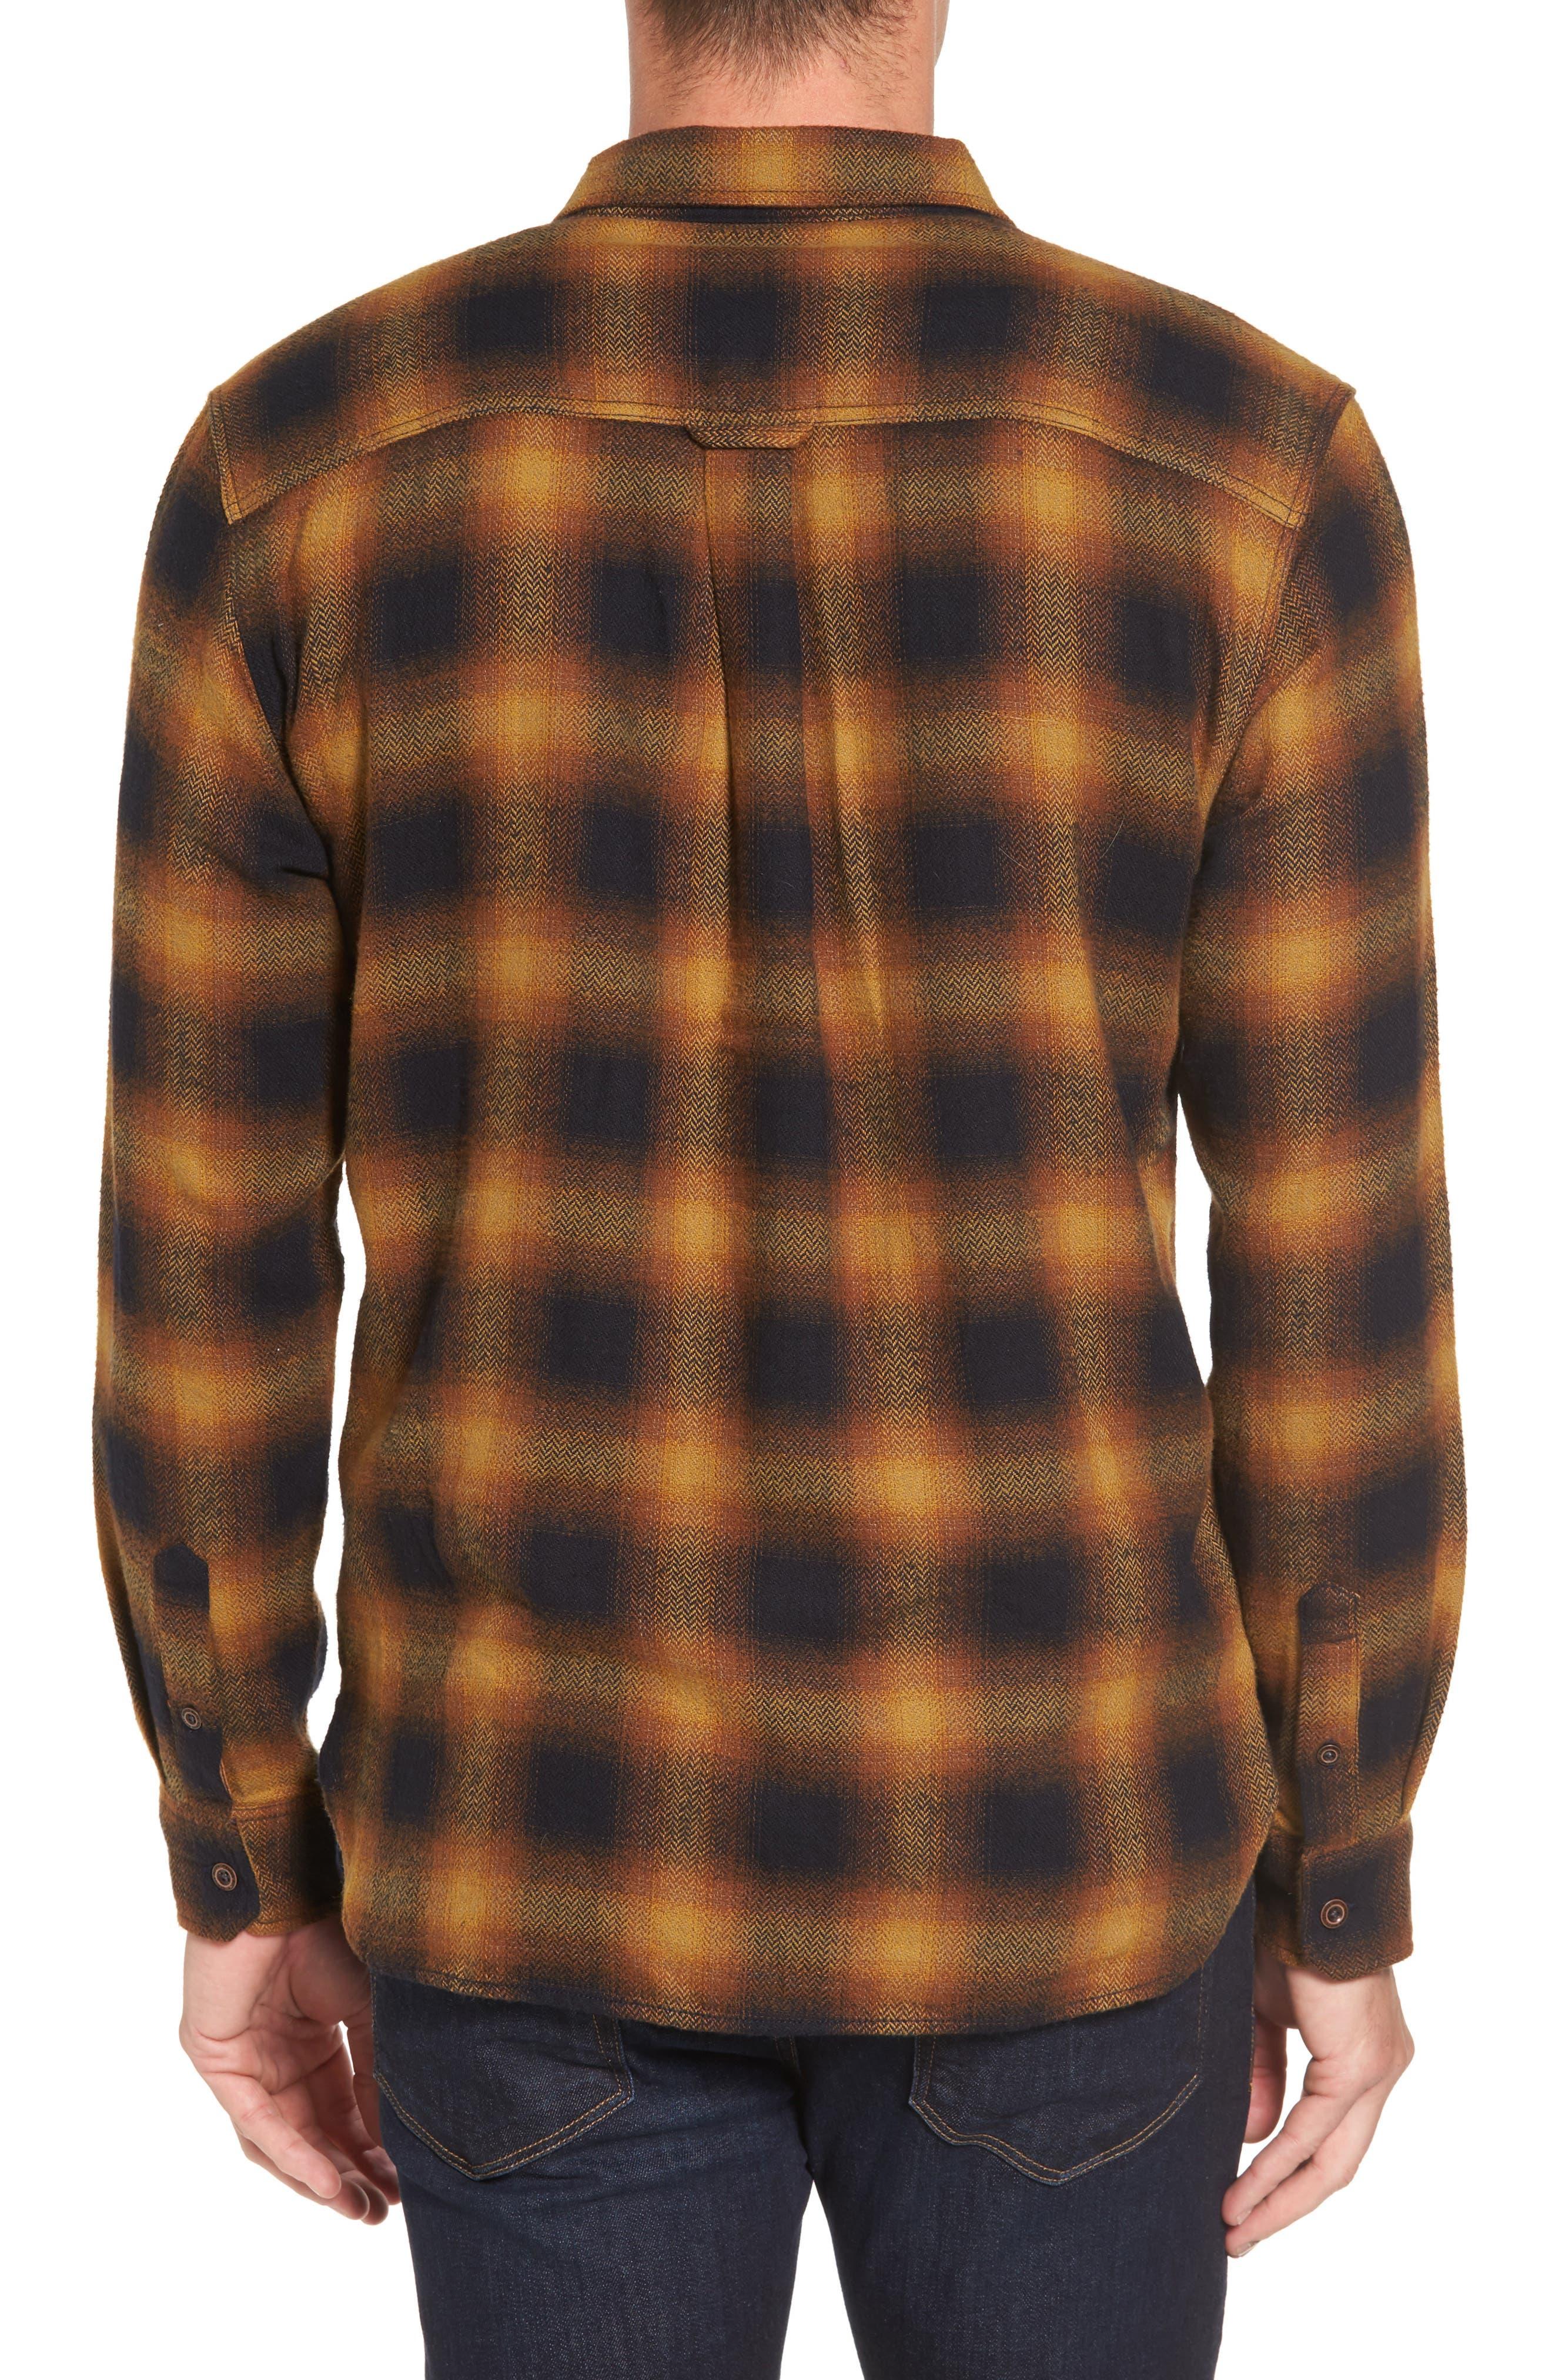 Truman Check Herringbone Shirt,                             Alternate thumbnail 2, color,                             200